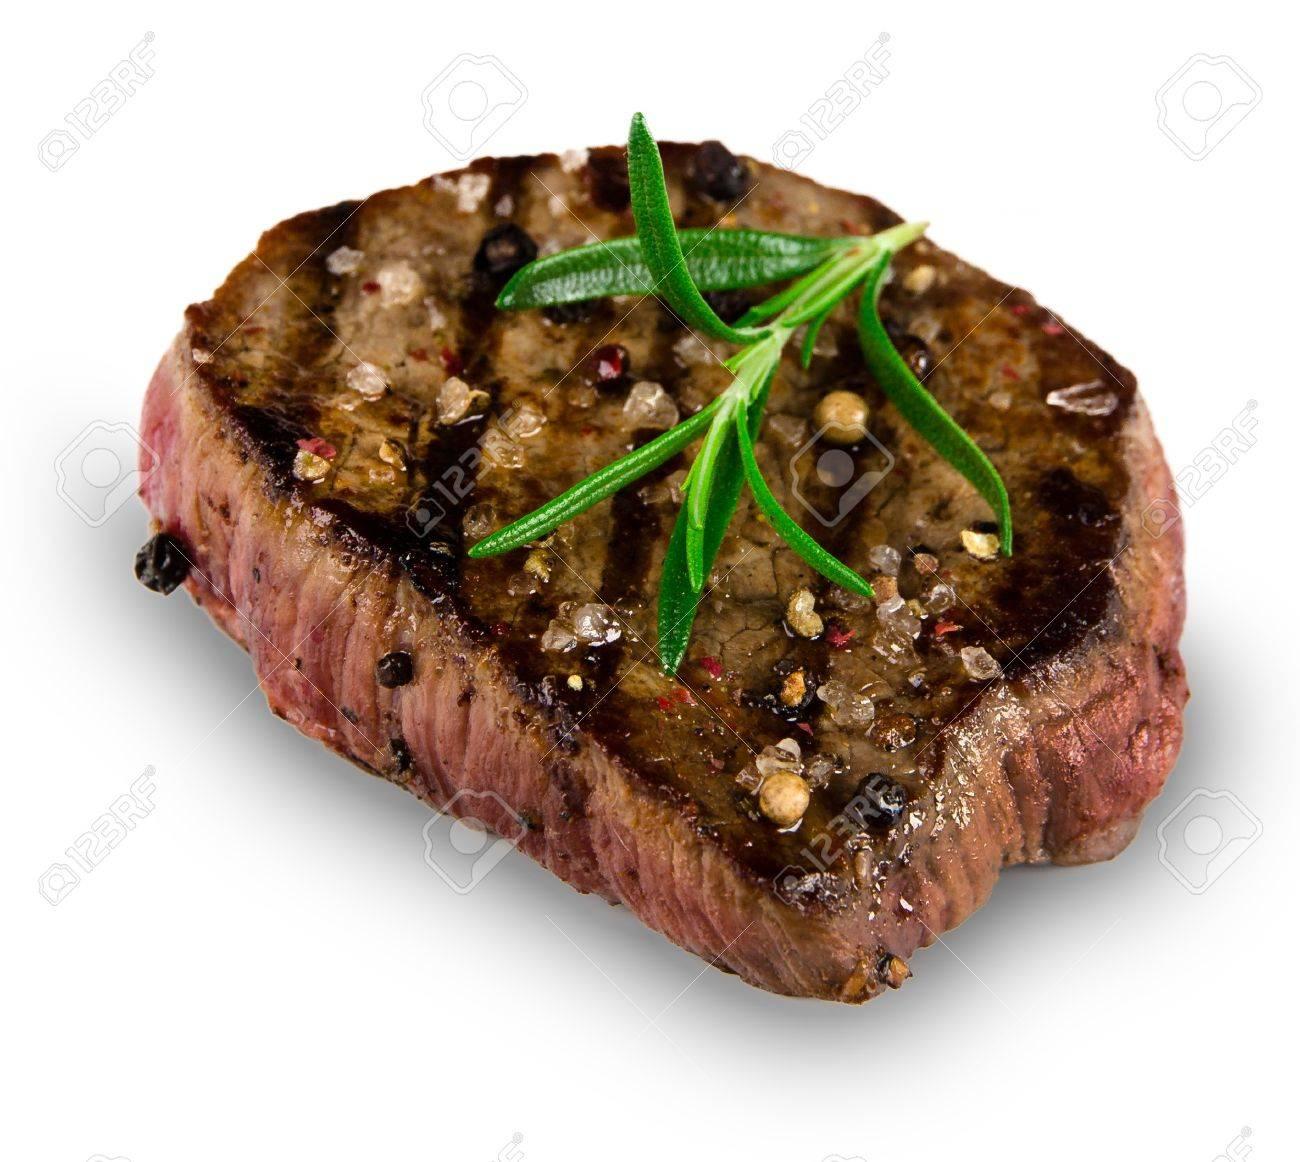 Grilled bbq steak on white background Stock Photo - 15764371